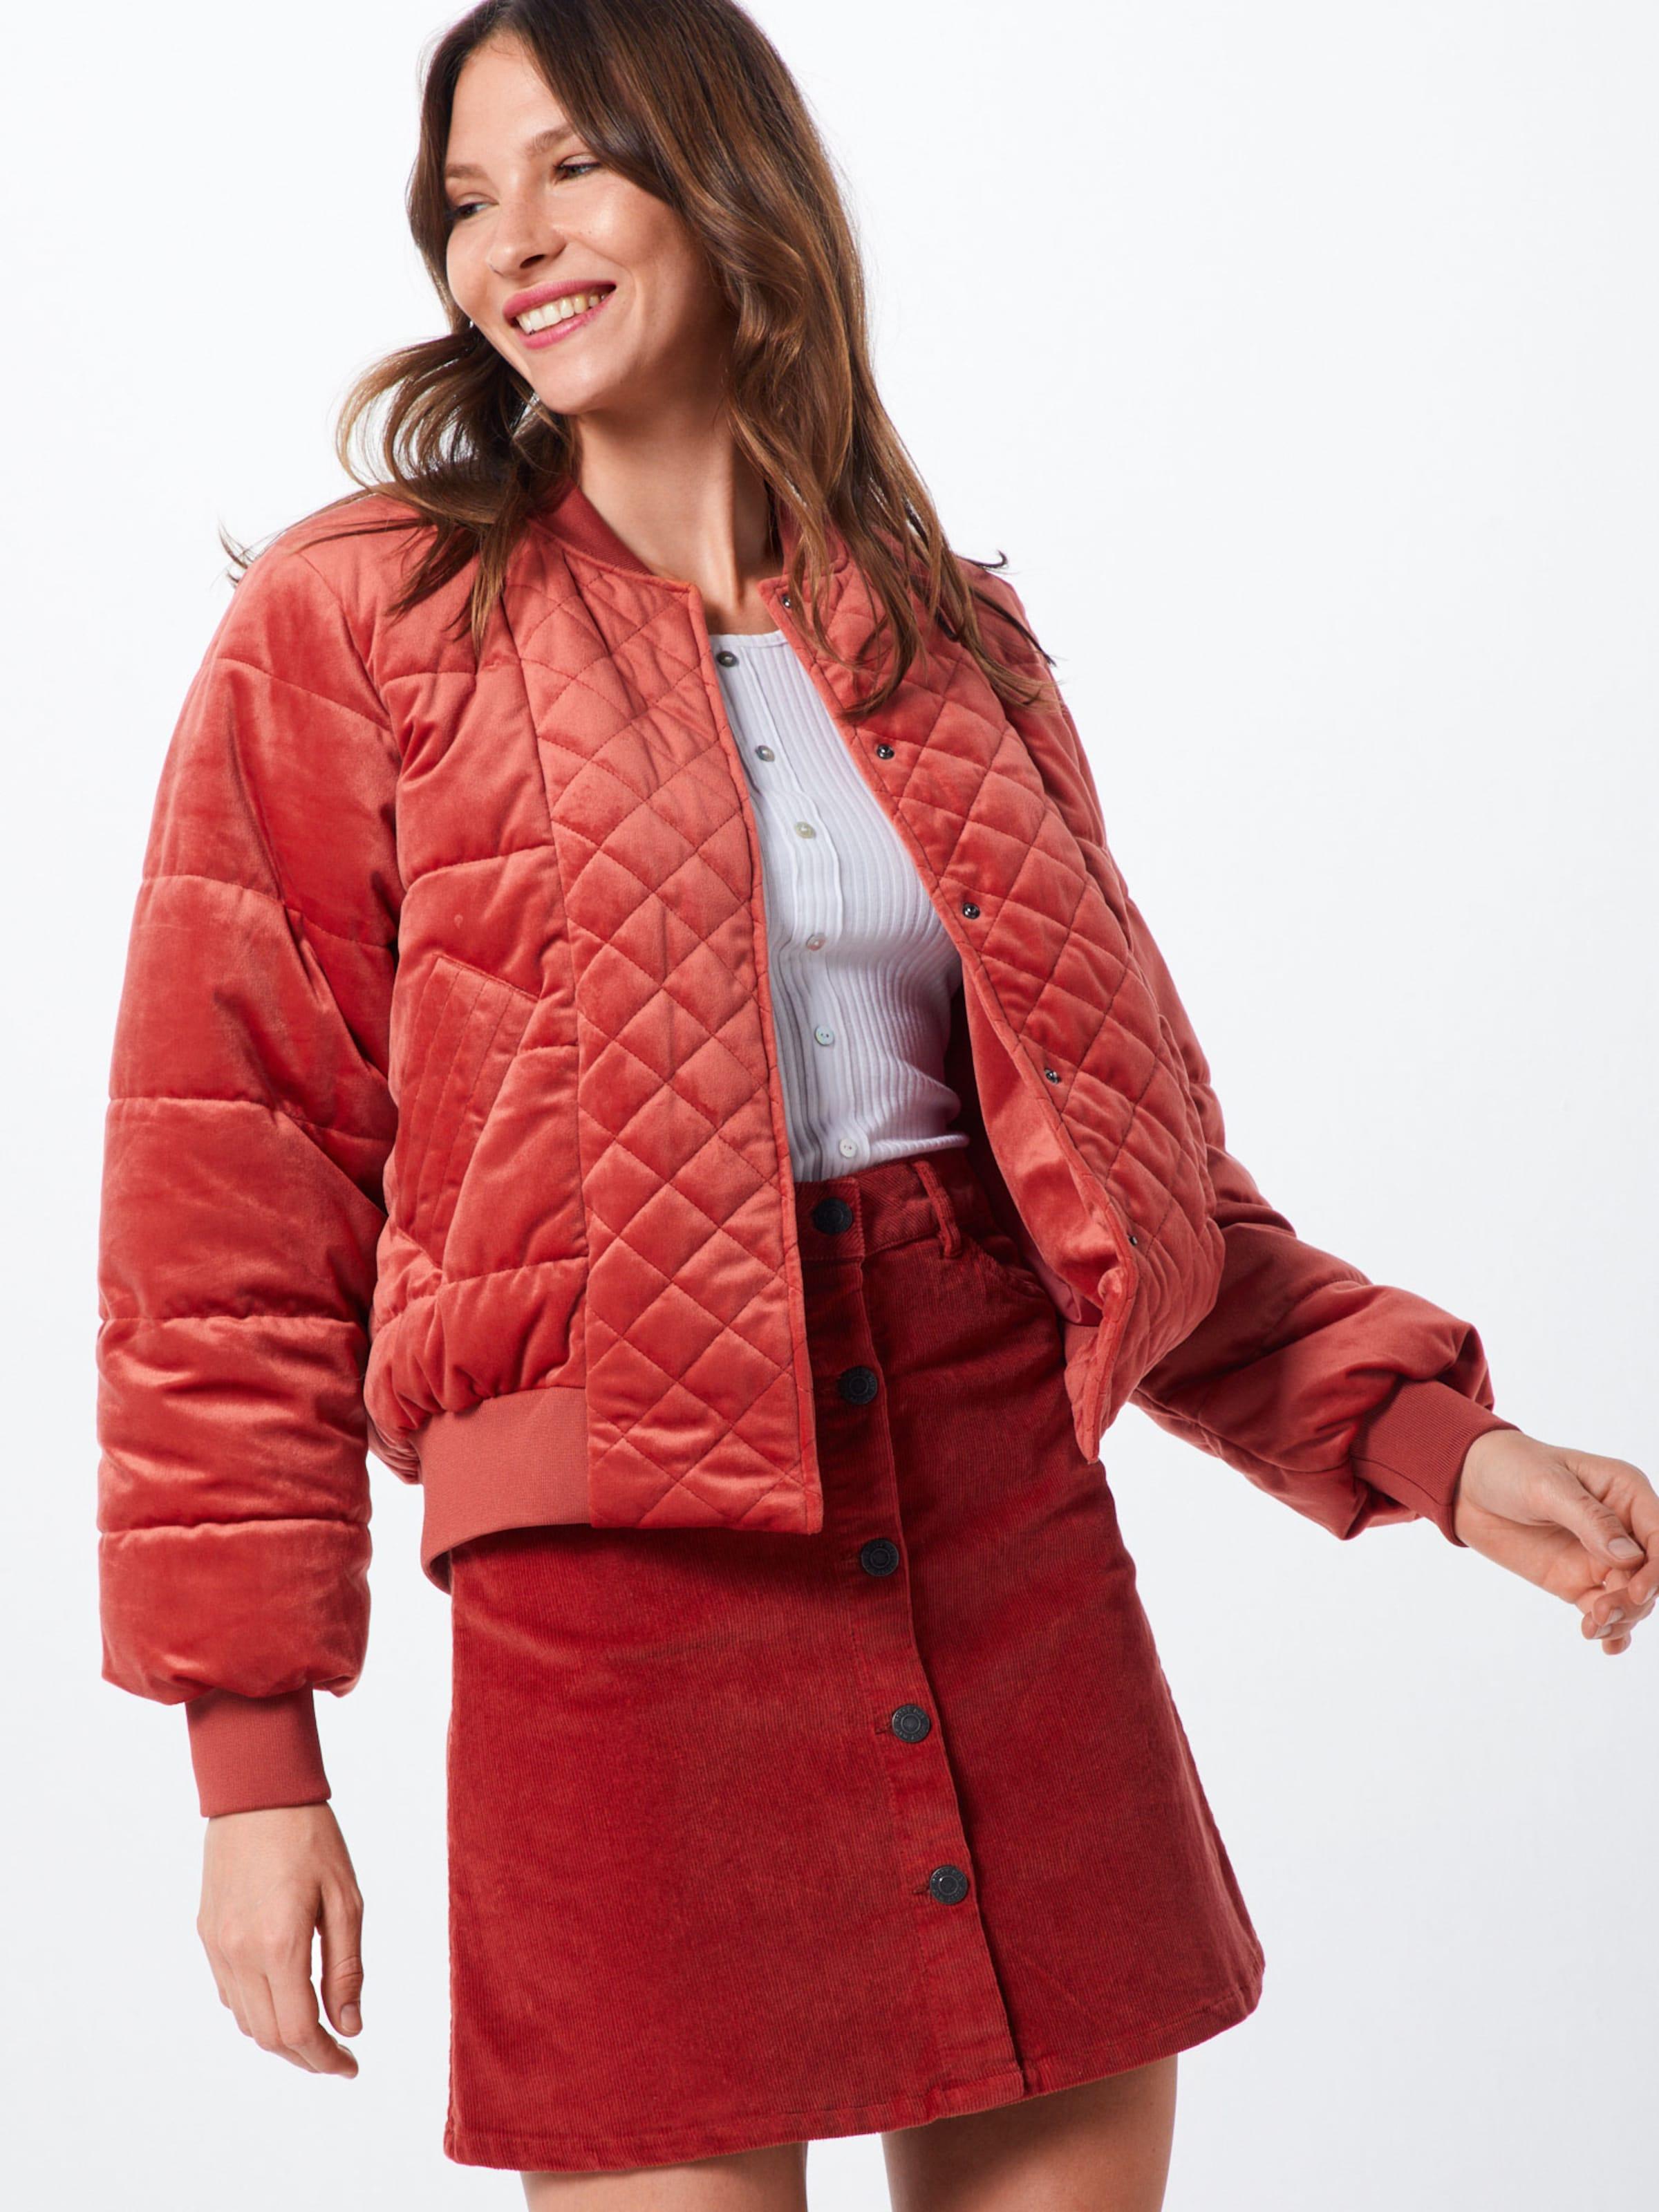 Noisy saison L Mi s Rouge May 'finn En Jacket' Veste 3LqcAS54jR